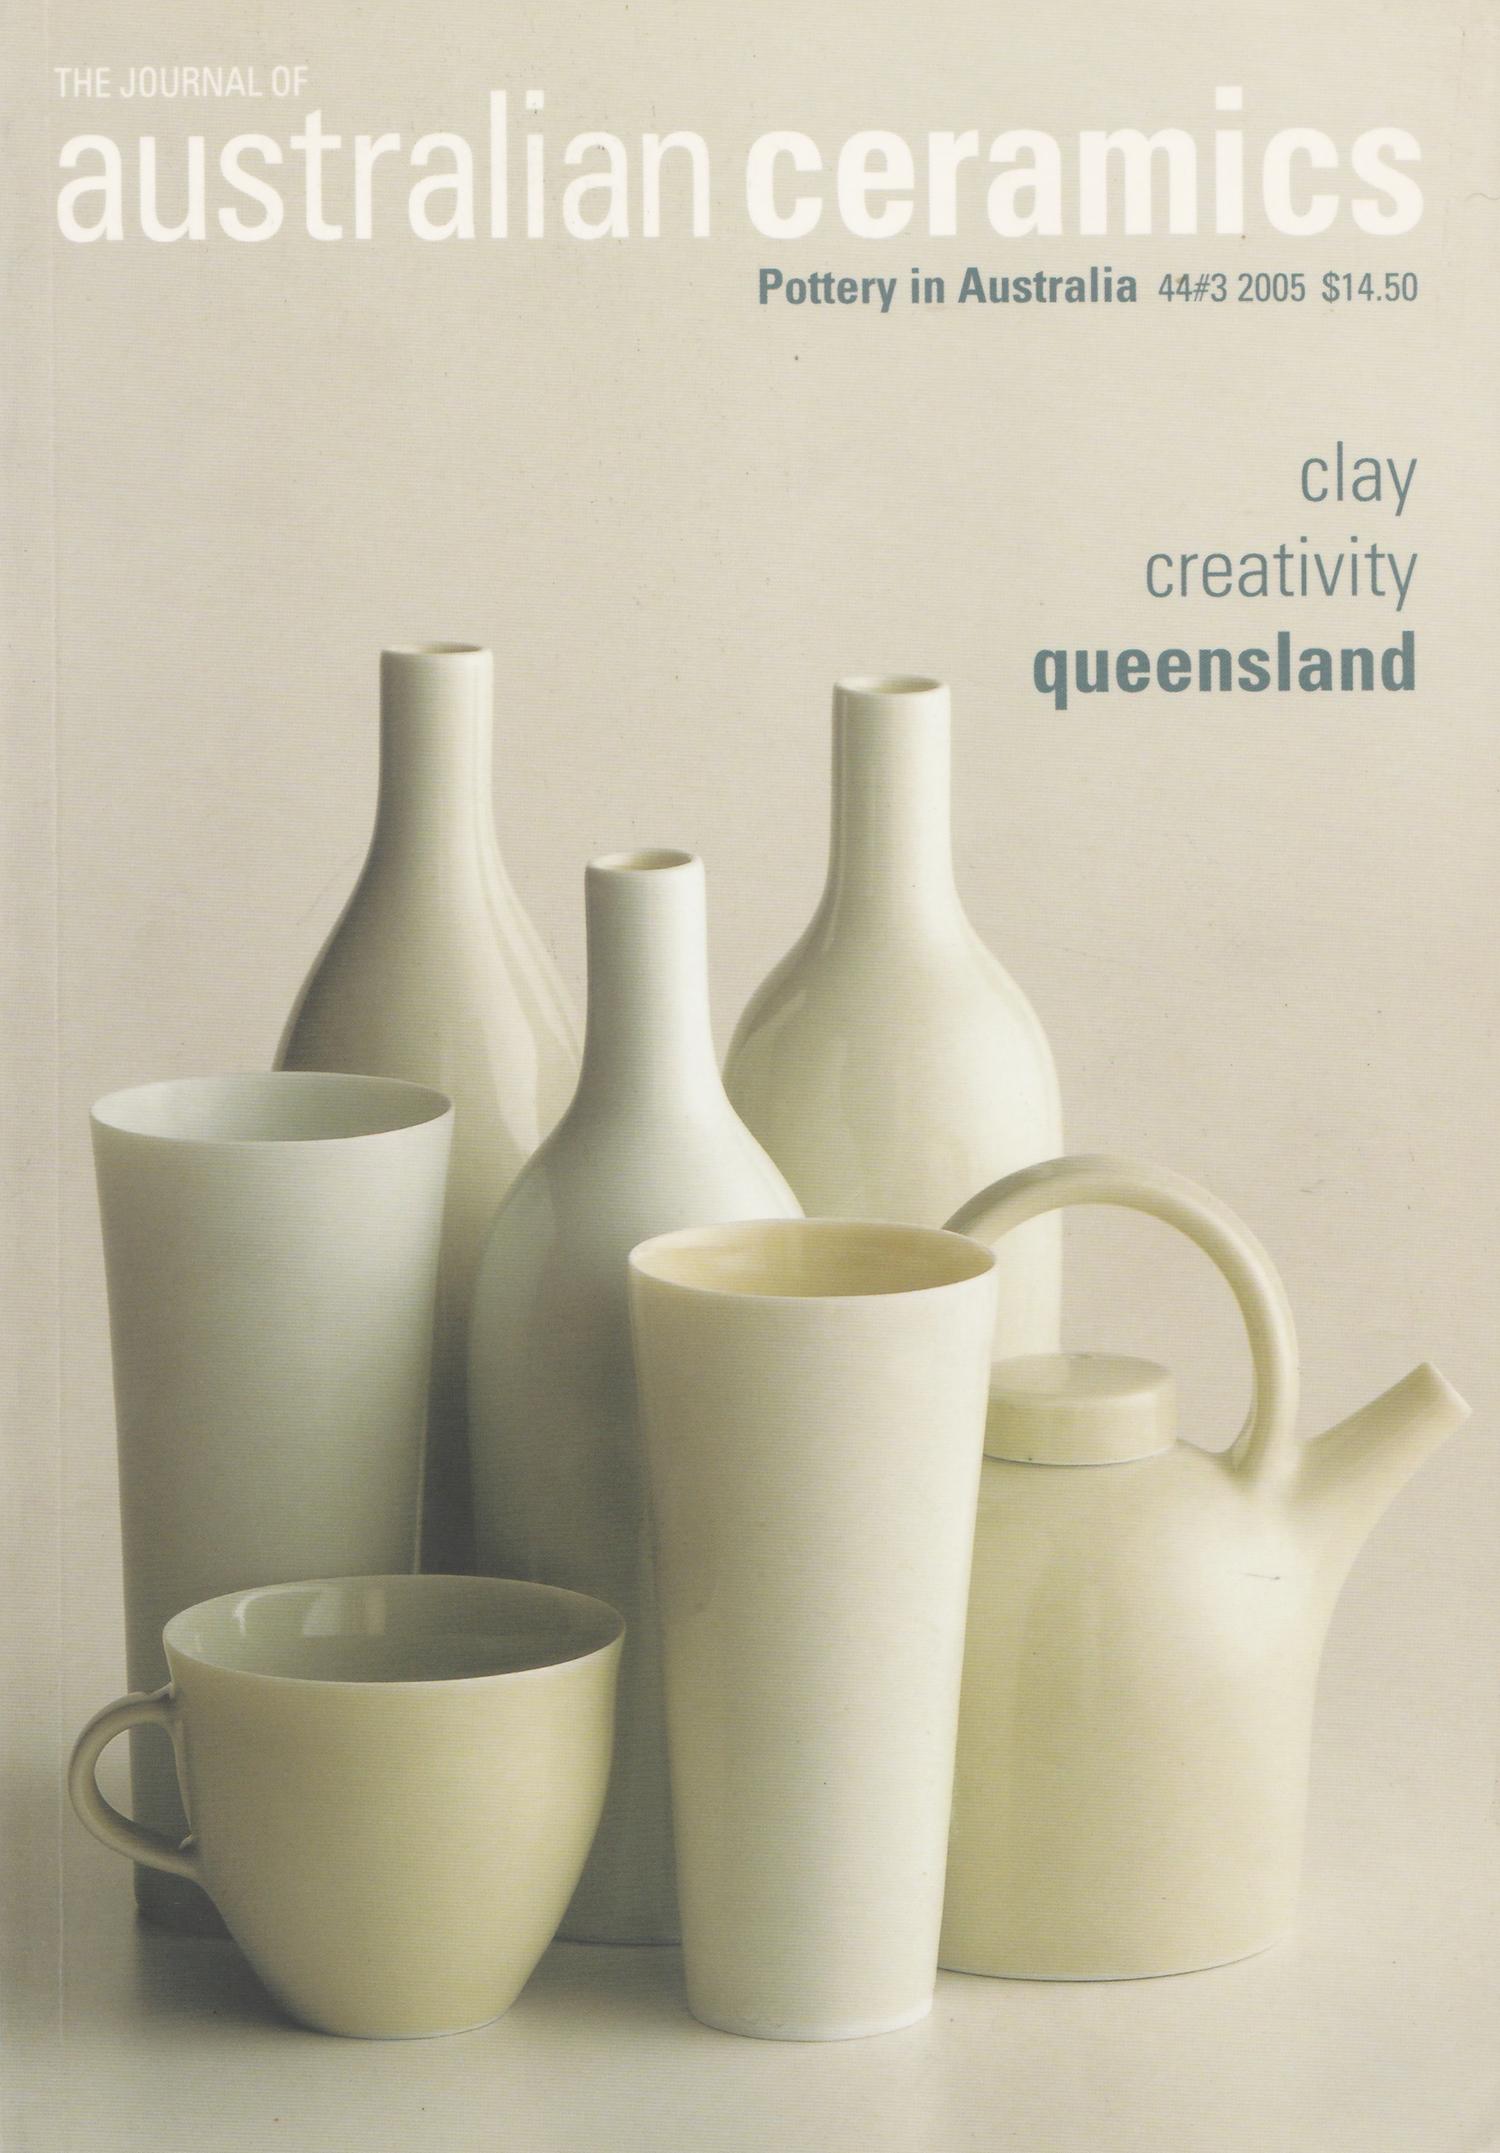 Guest Editor, Journal of Australian Ceramics 44/3 2005